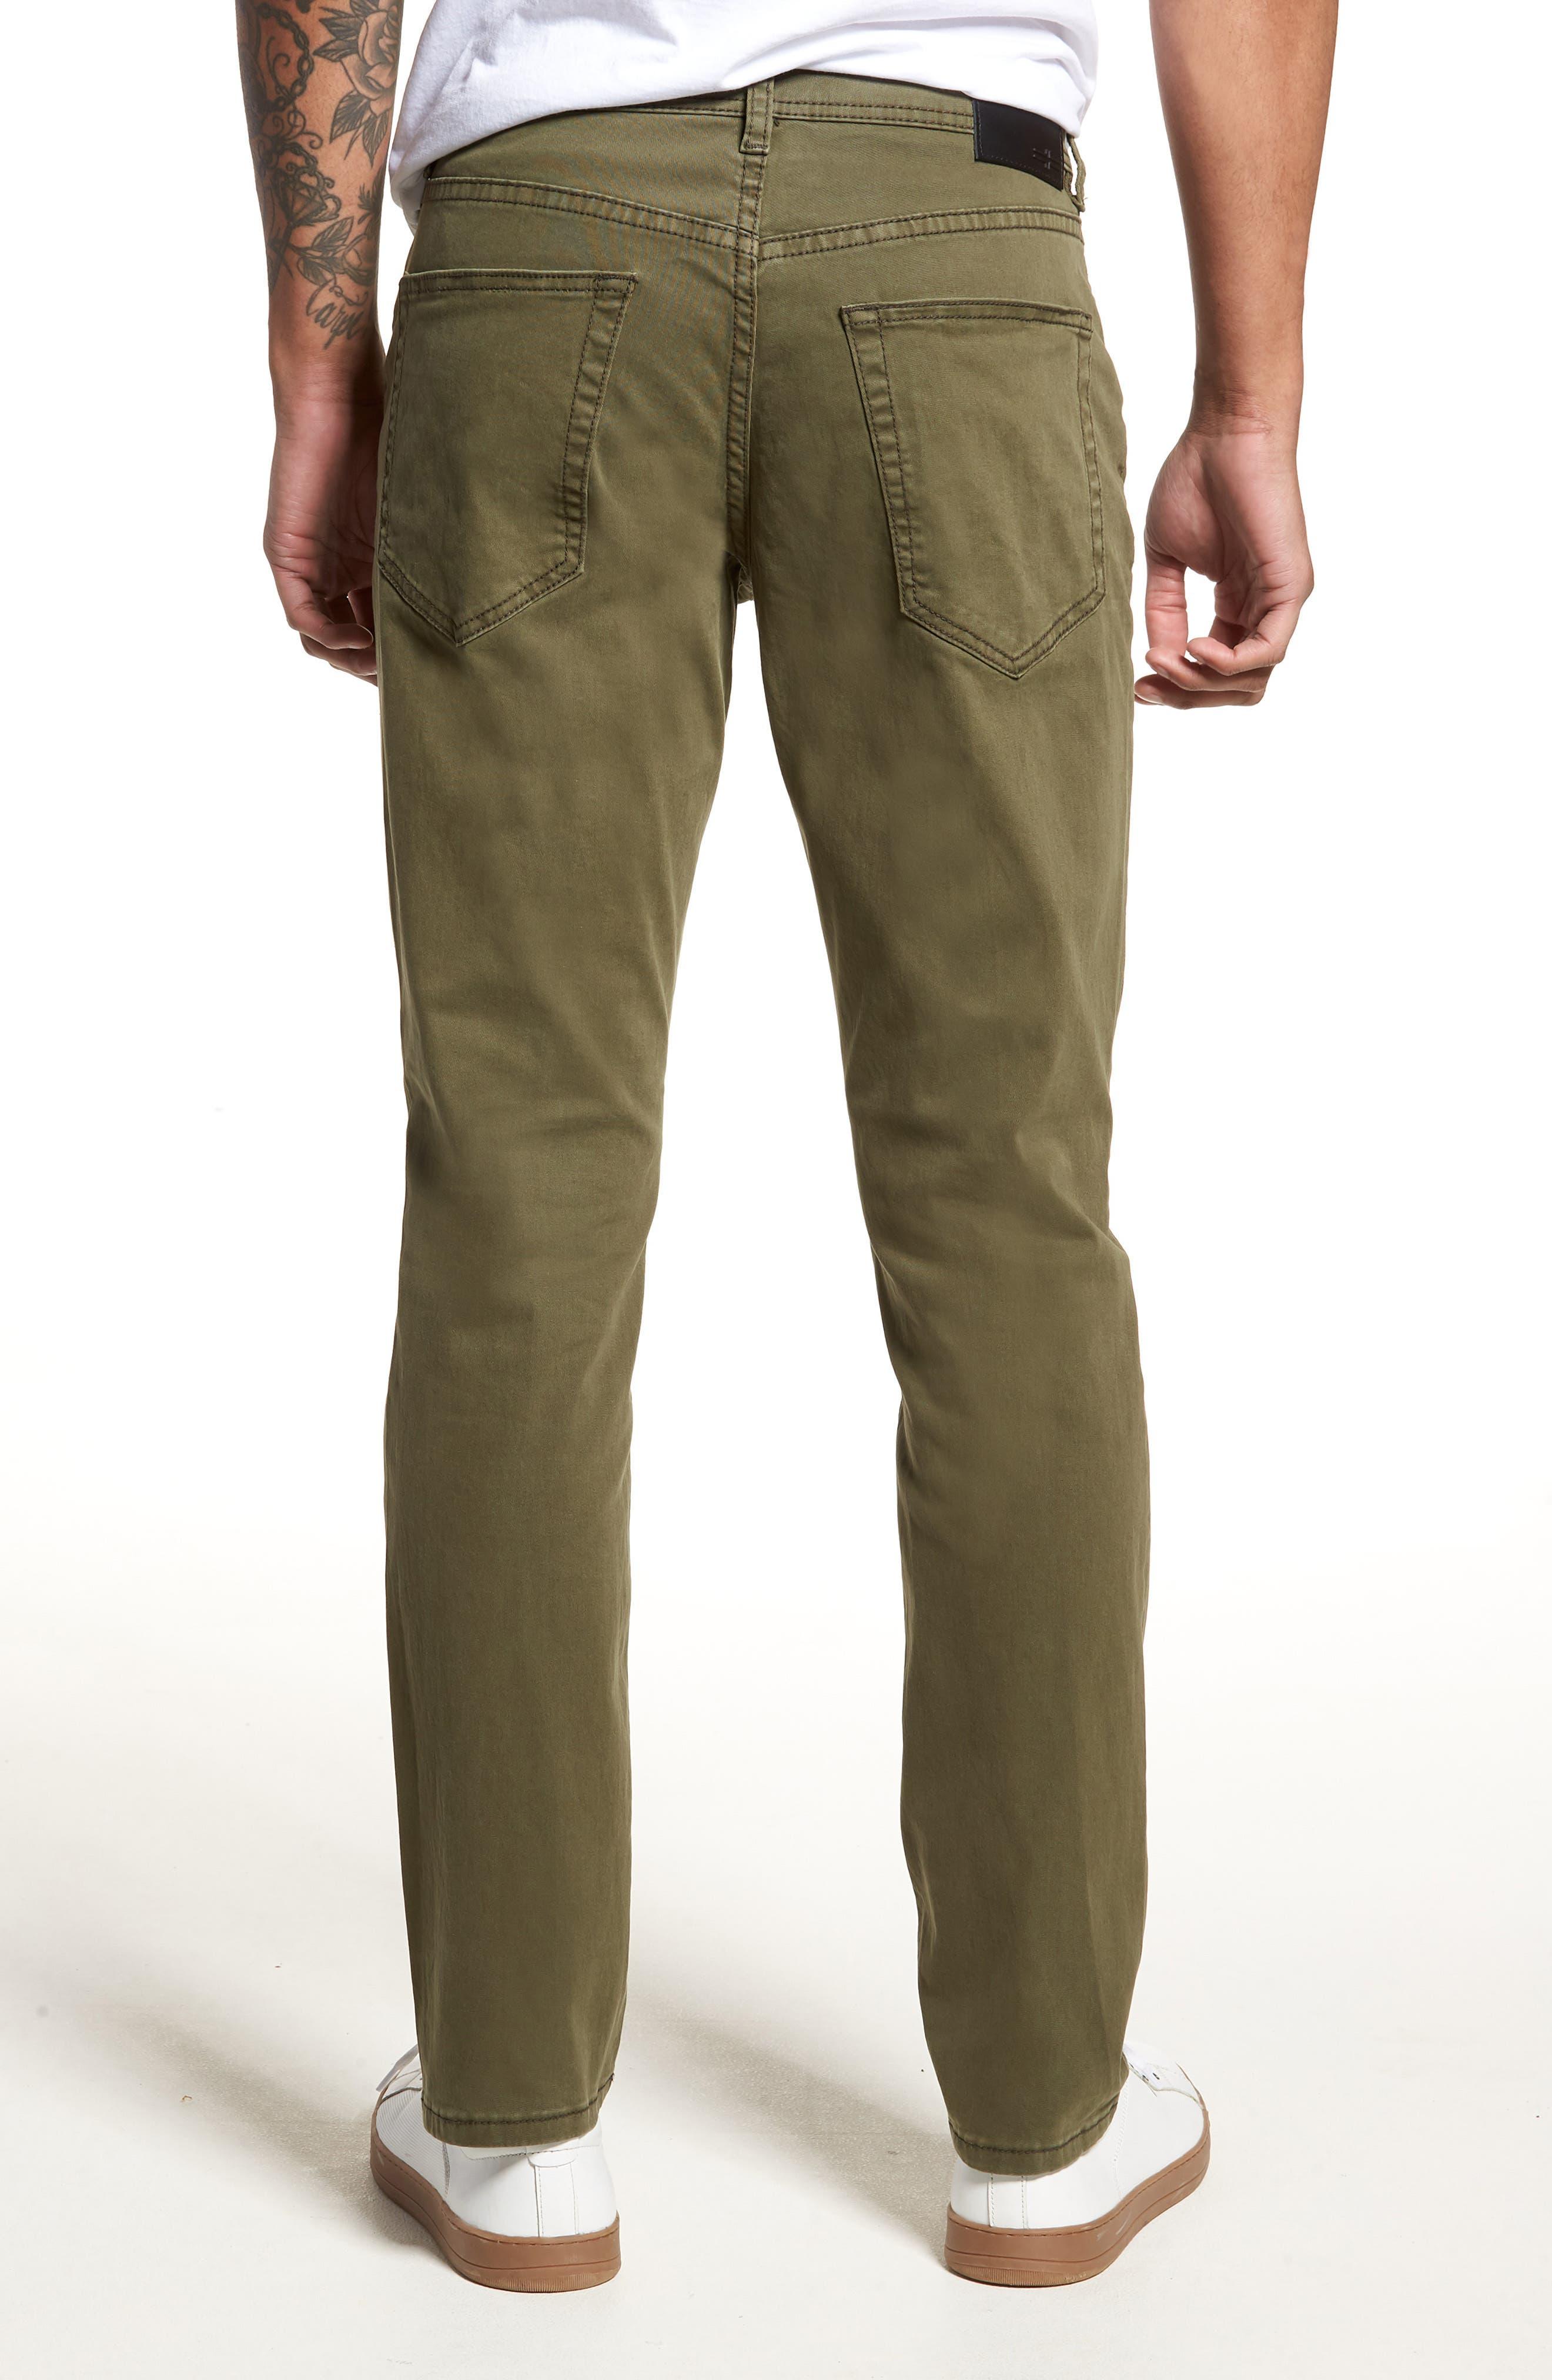 Jeans Co. Kingston Slim Straight Leg Jeans,                             Alternate thumbnail 2, color,                             OLIVE NIGHT